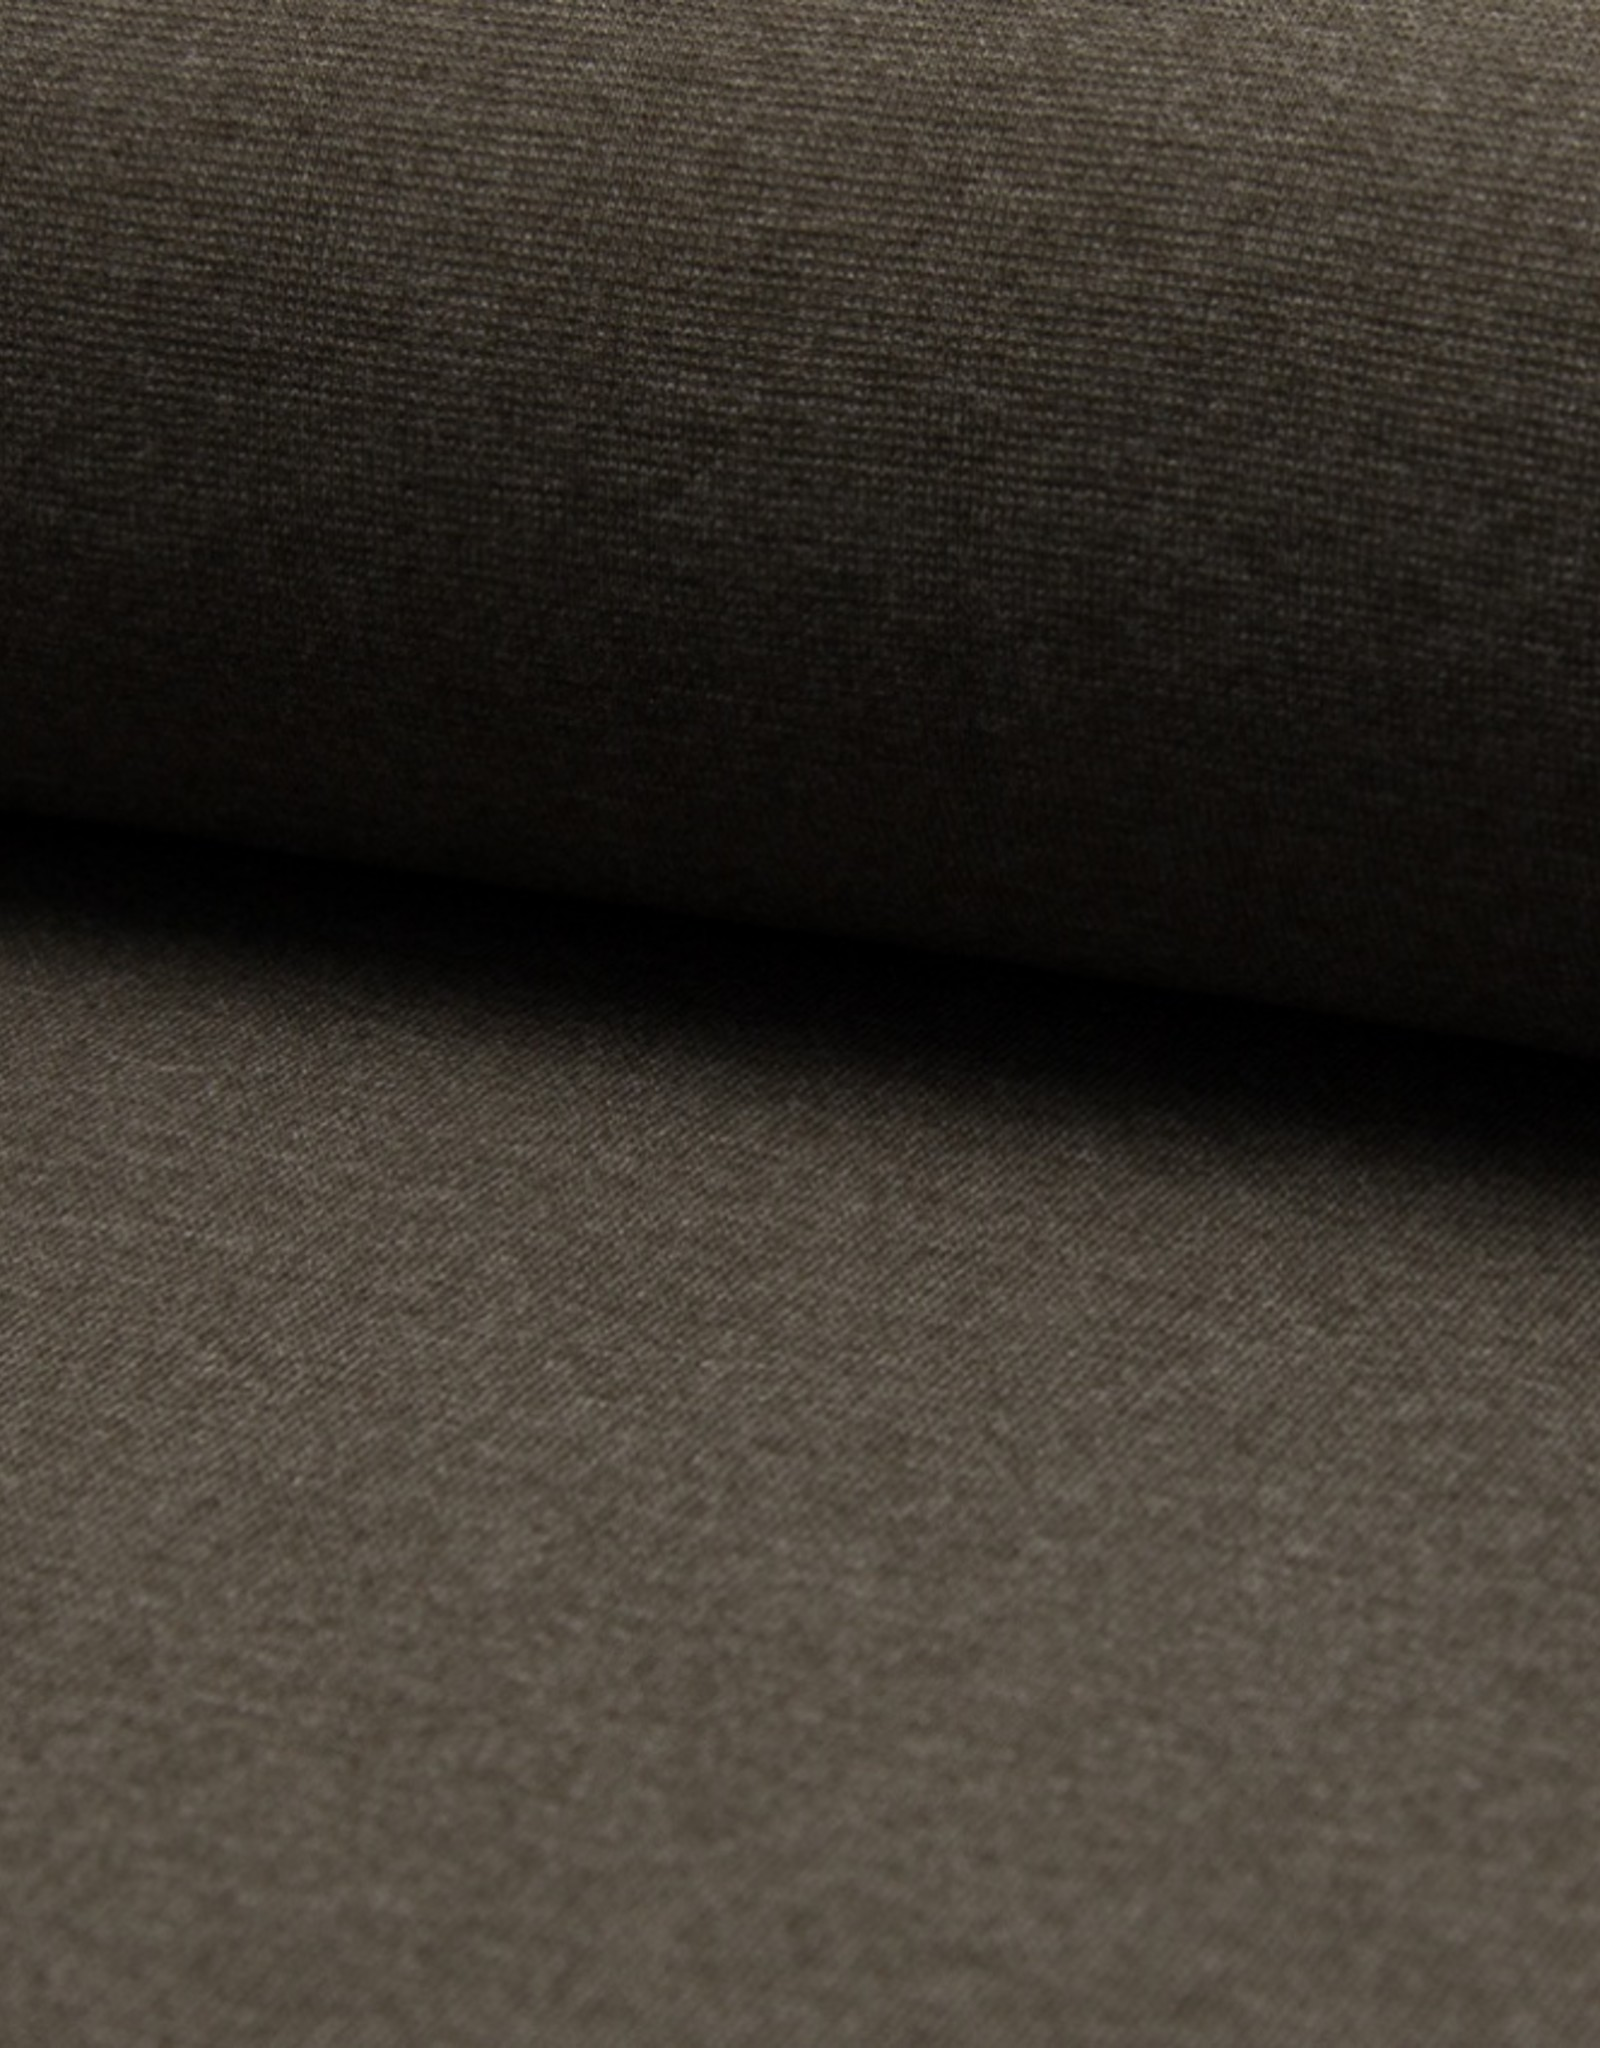 Boordstof dark donkerbruin 37cm tubular